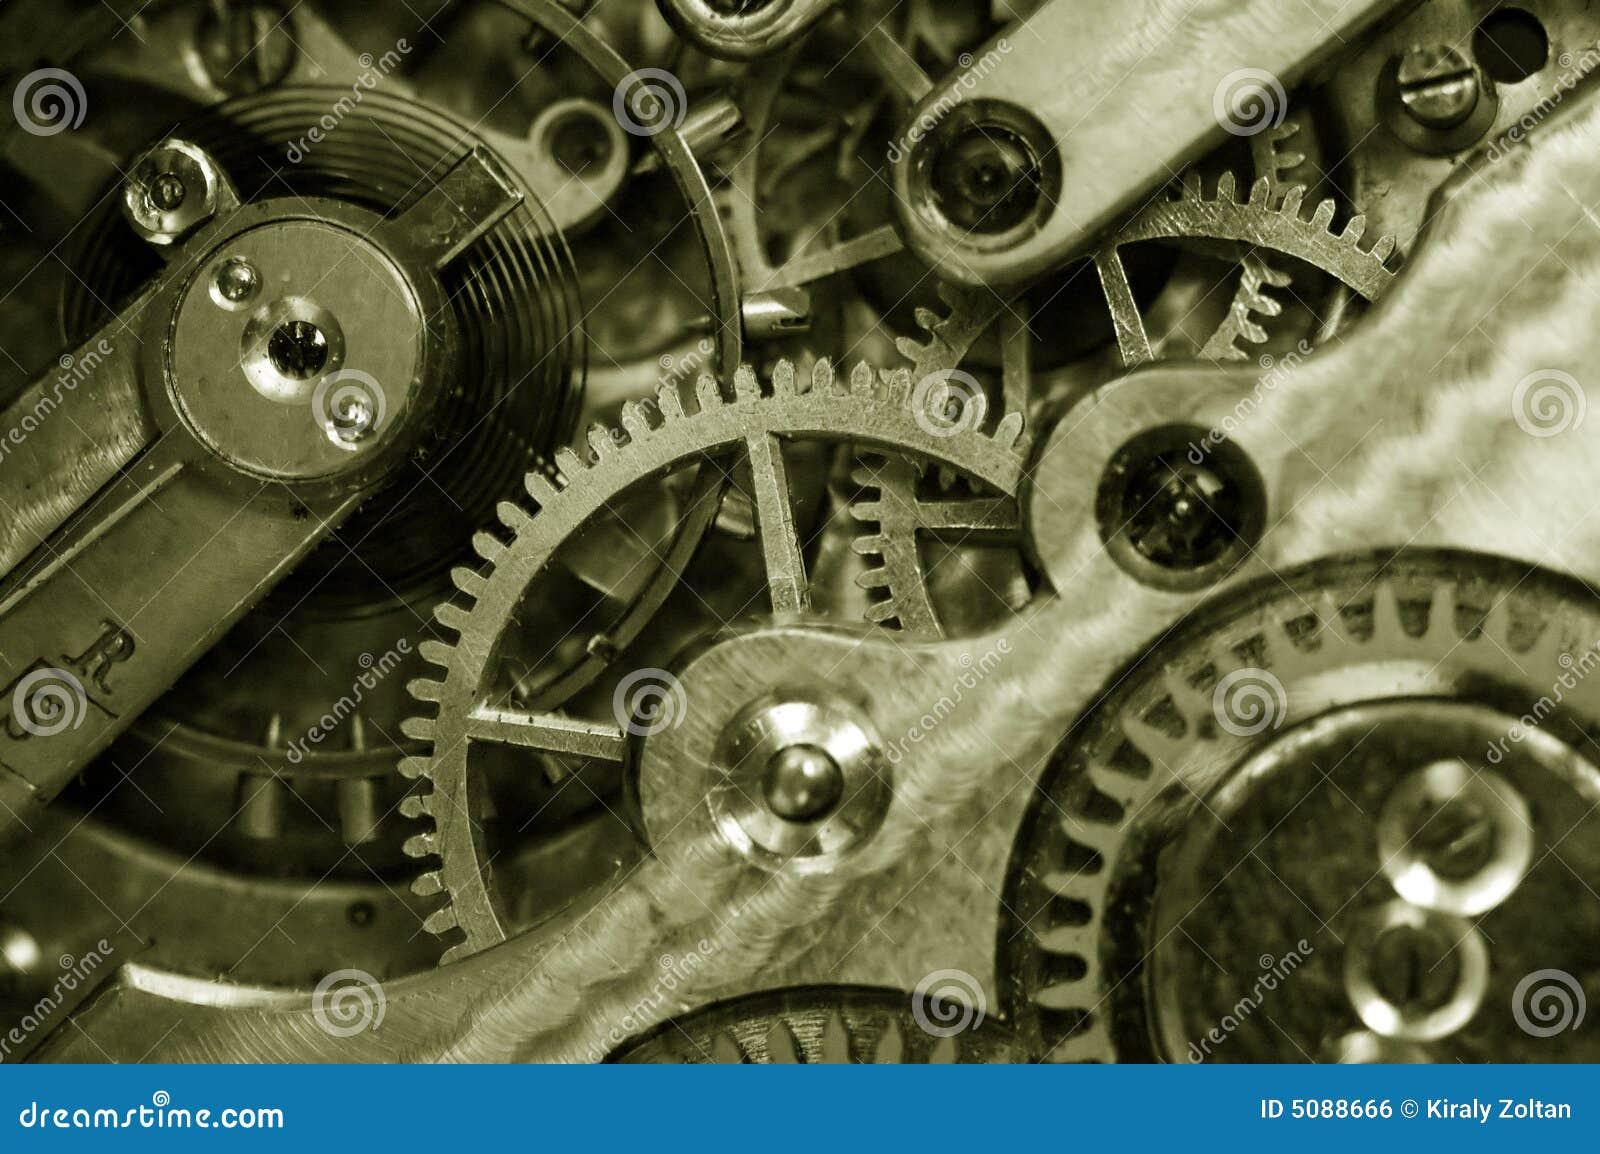 Insideof an old pocket watch